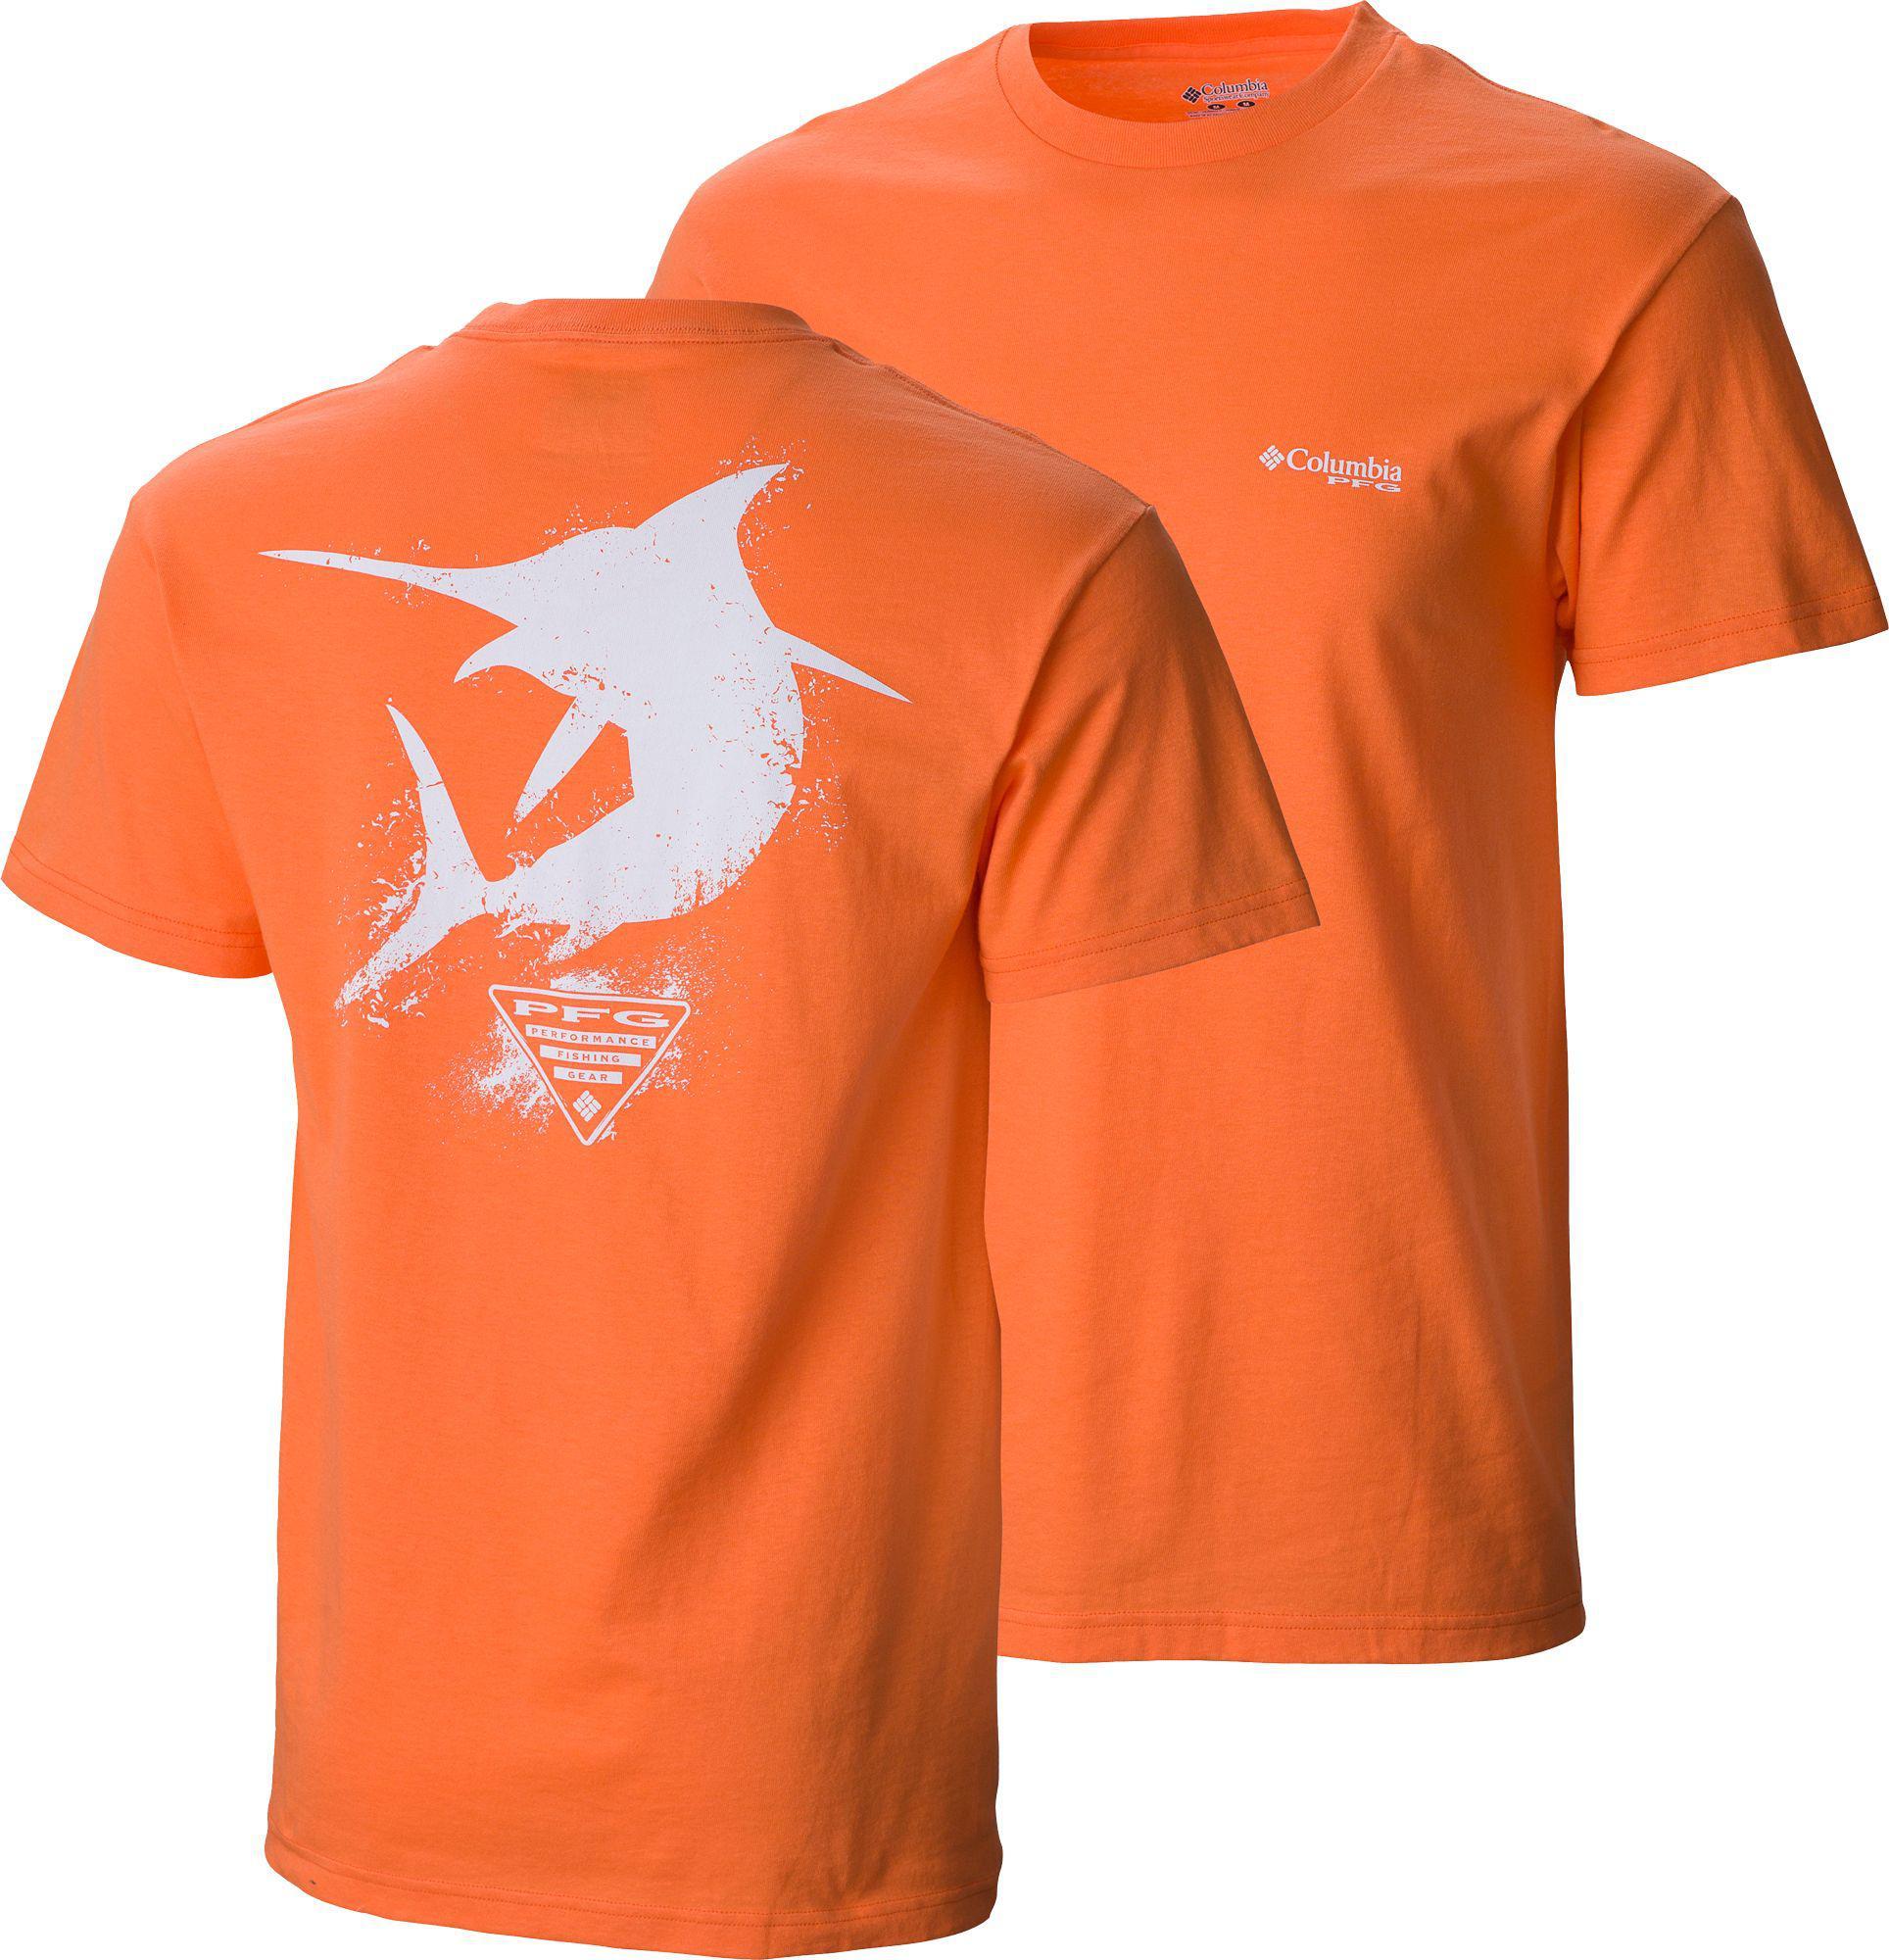 5c0923840d0 Columbia Pfg Silhouette Series Marlin T-shirt in Orange for Men - Lyst